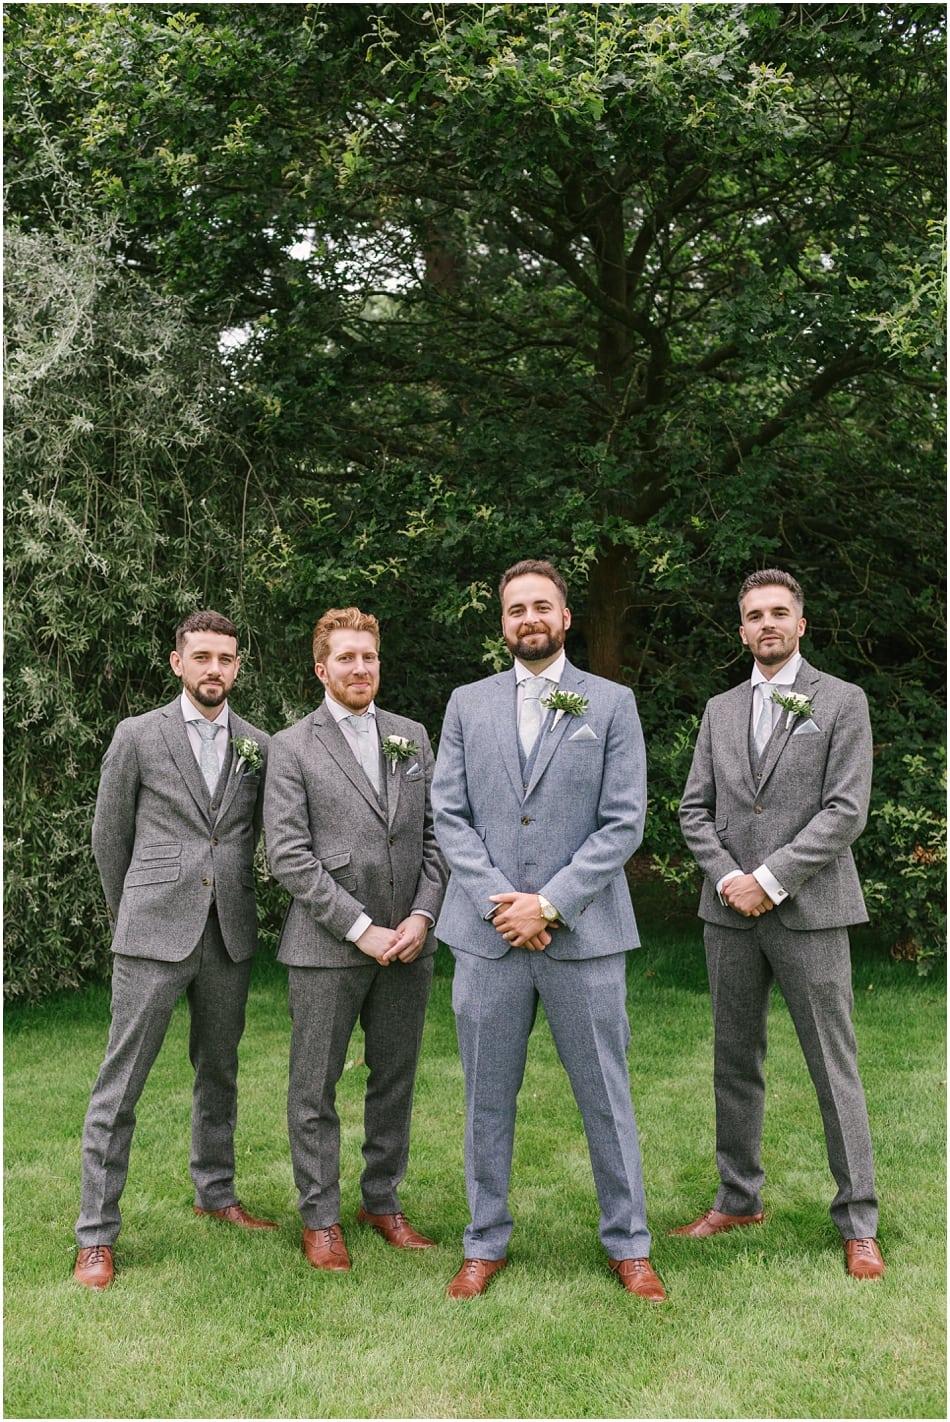 Groomsmen at an Iscoyd Park wedding